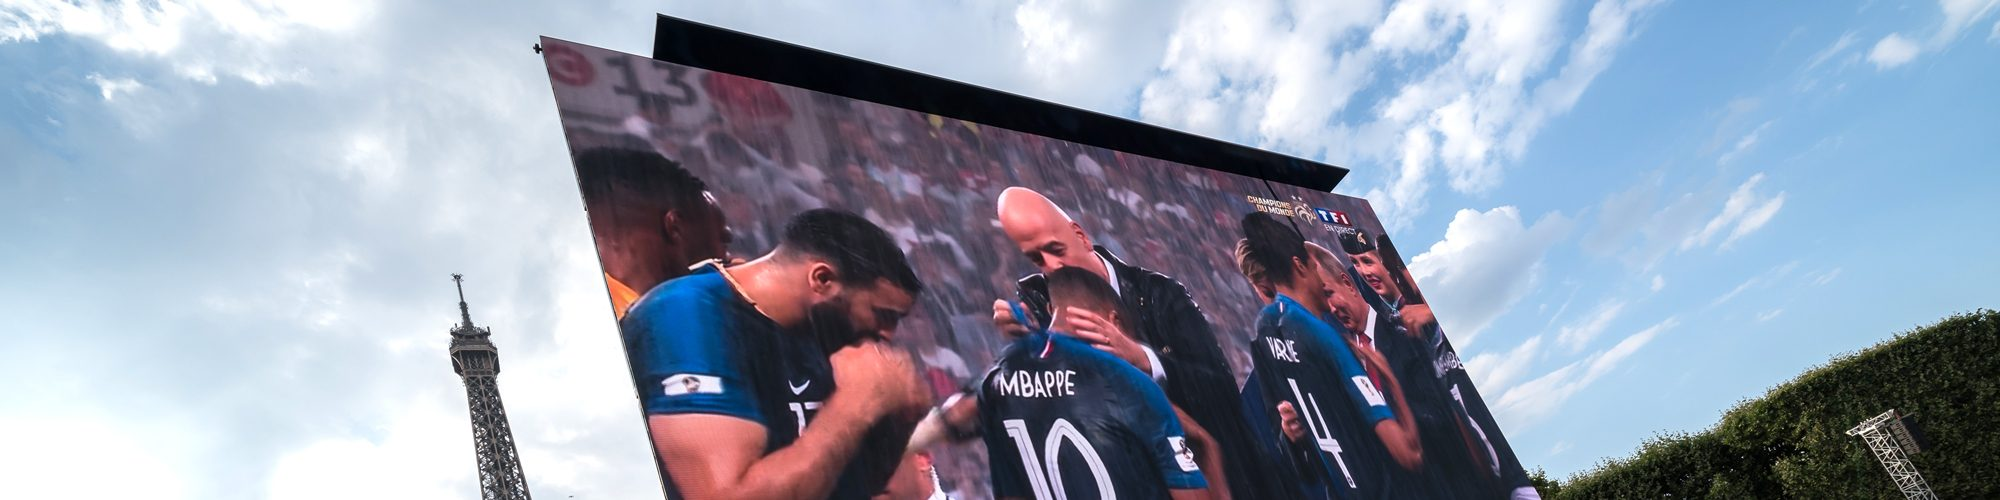 pantalla-gigante-LED-Supervision-Copa-Mundial-de-Futbol-Russia2018